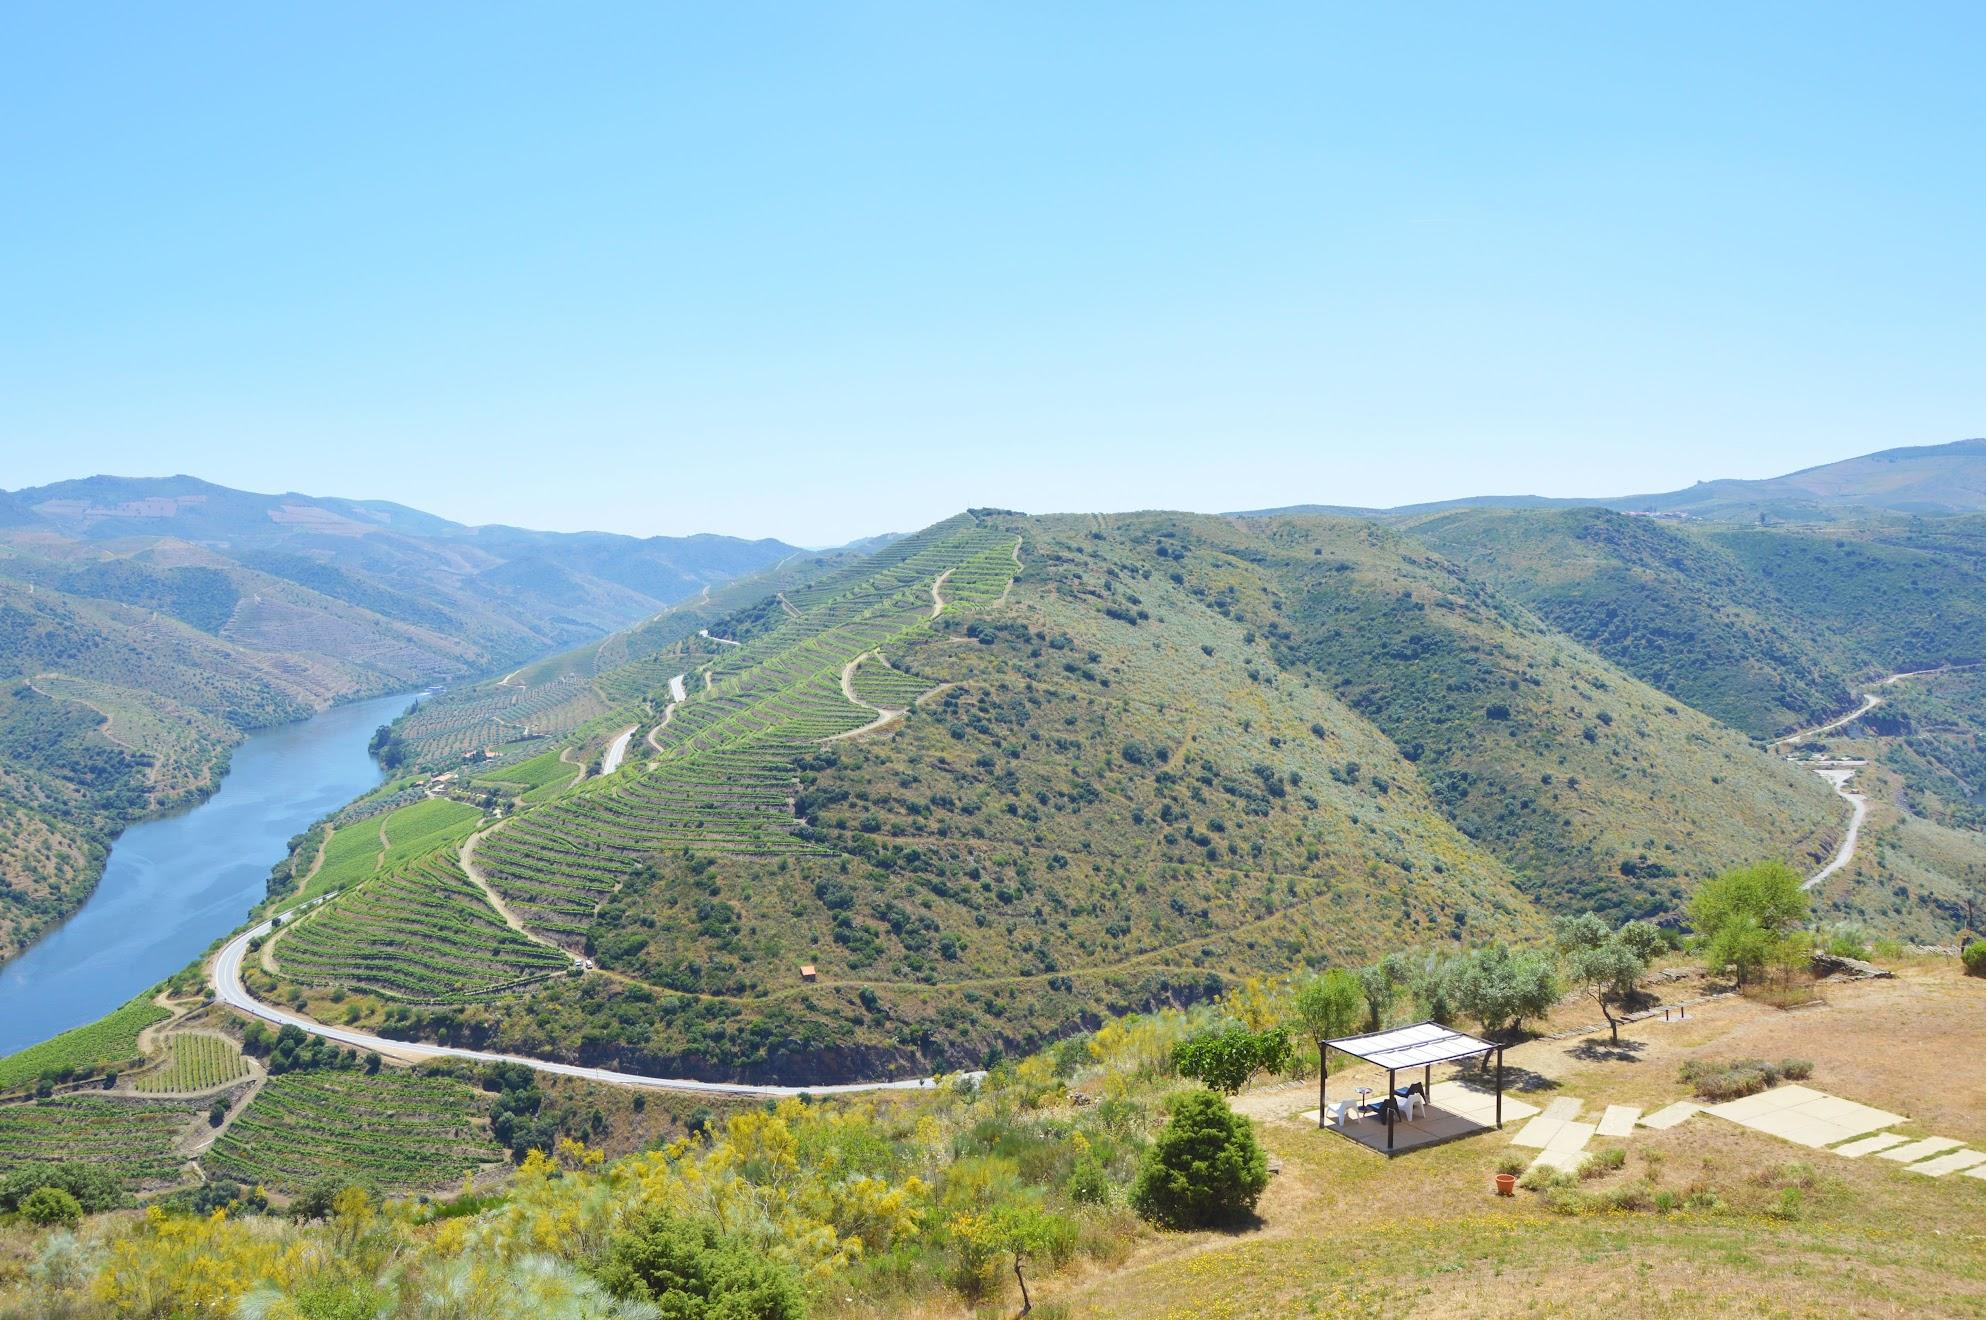 Douro-rivier